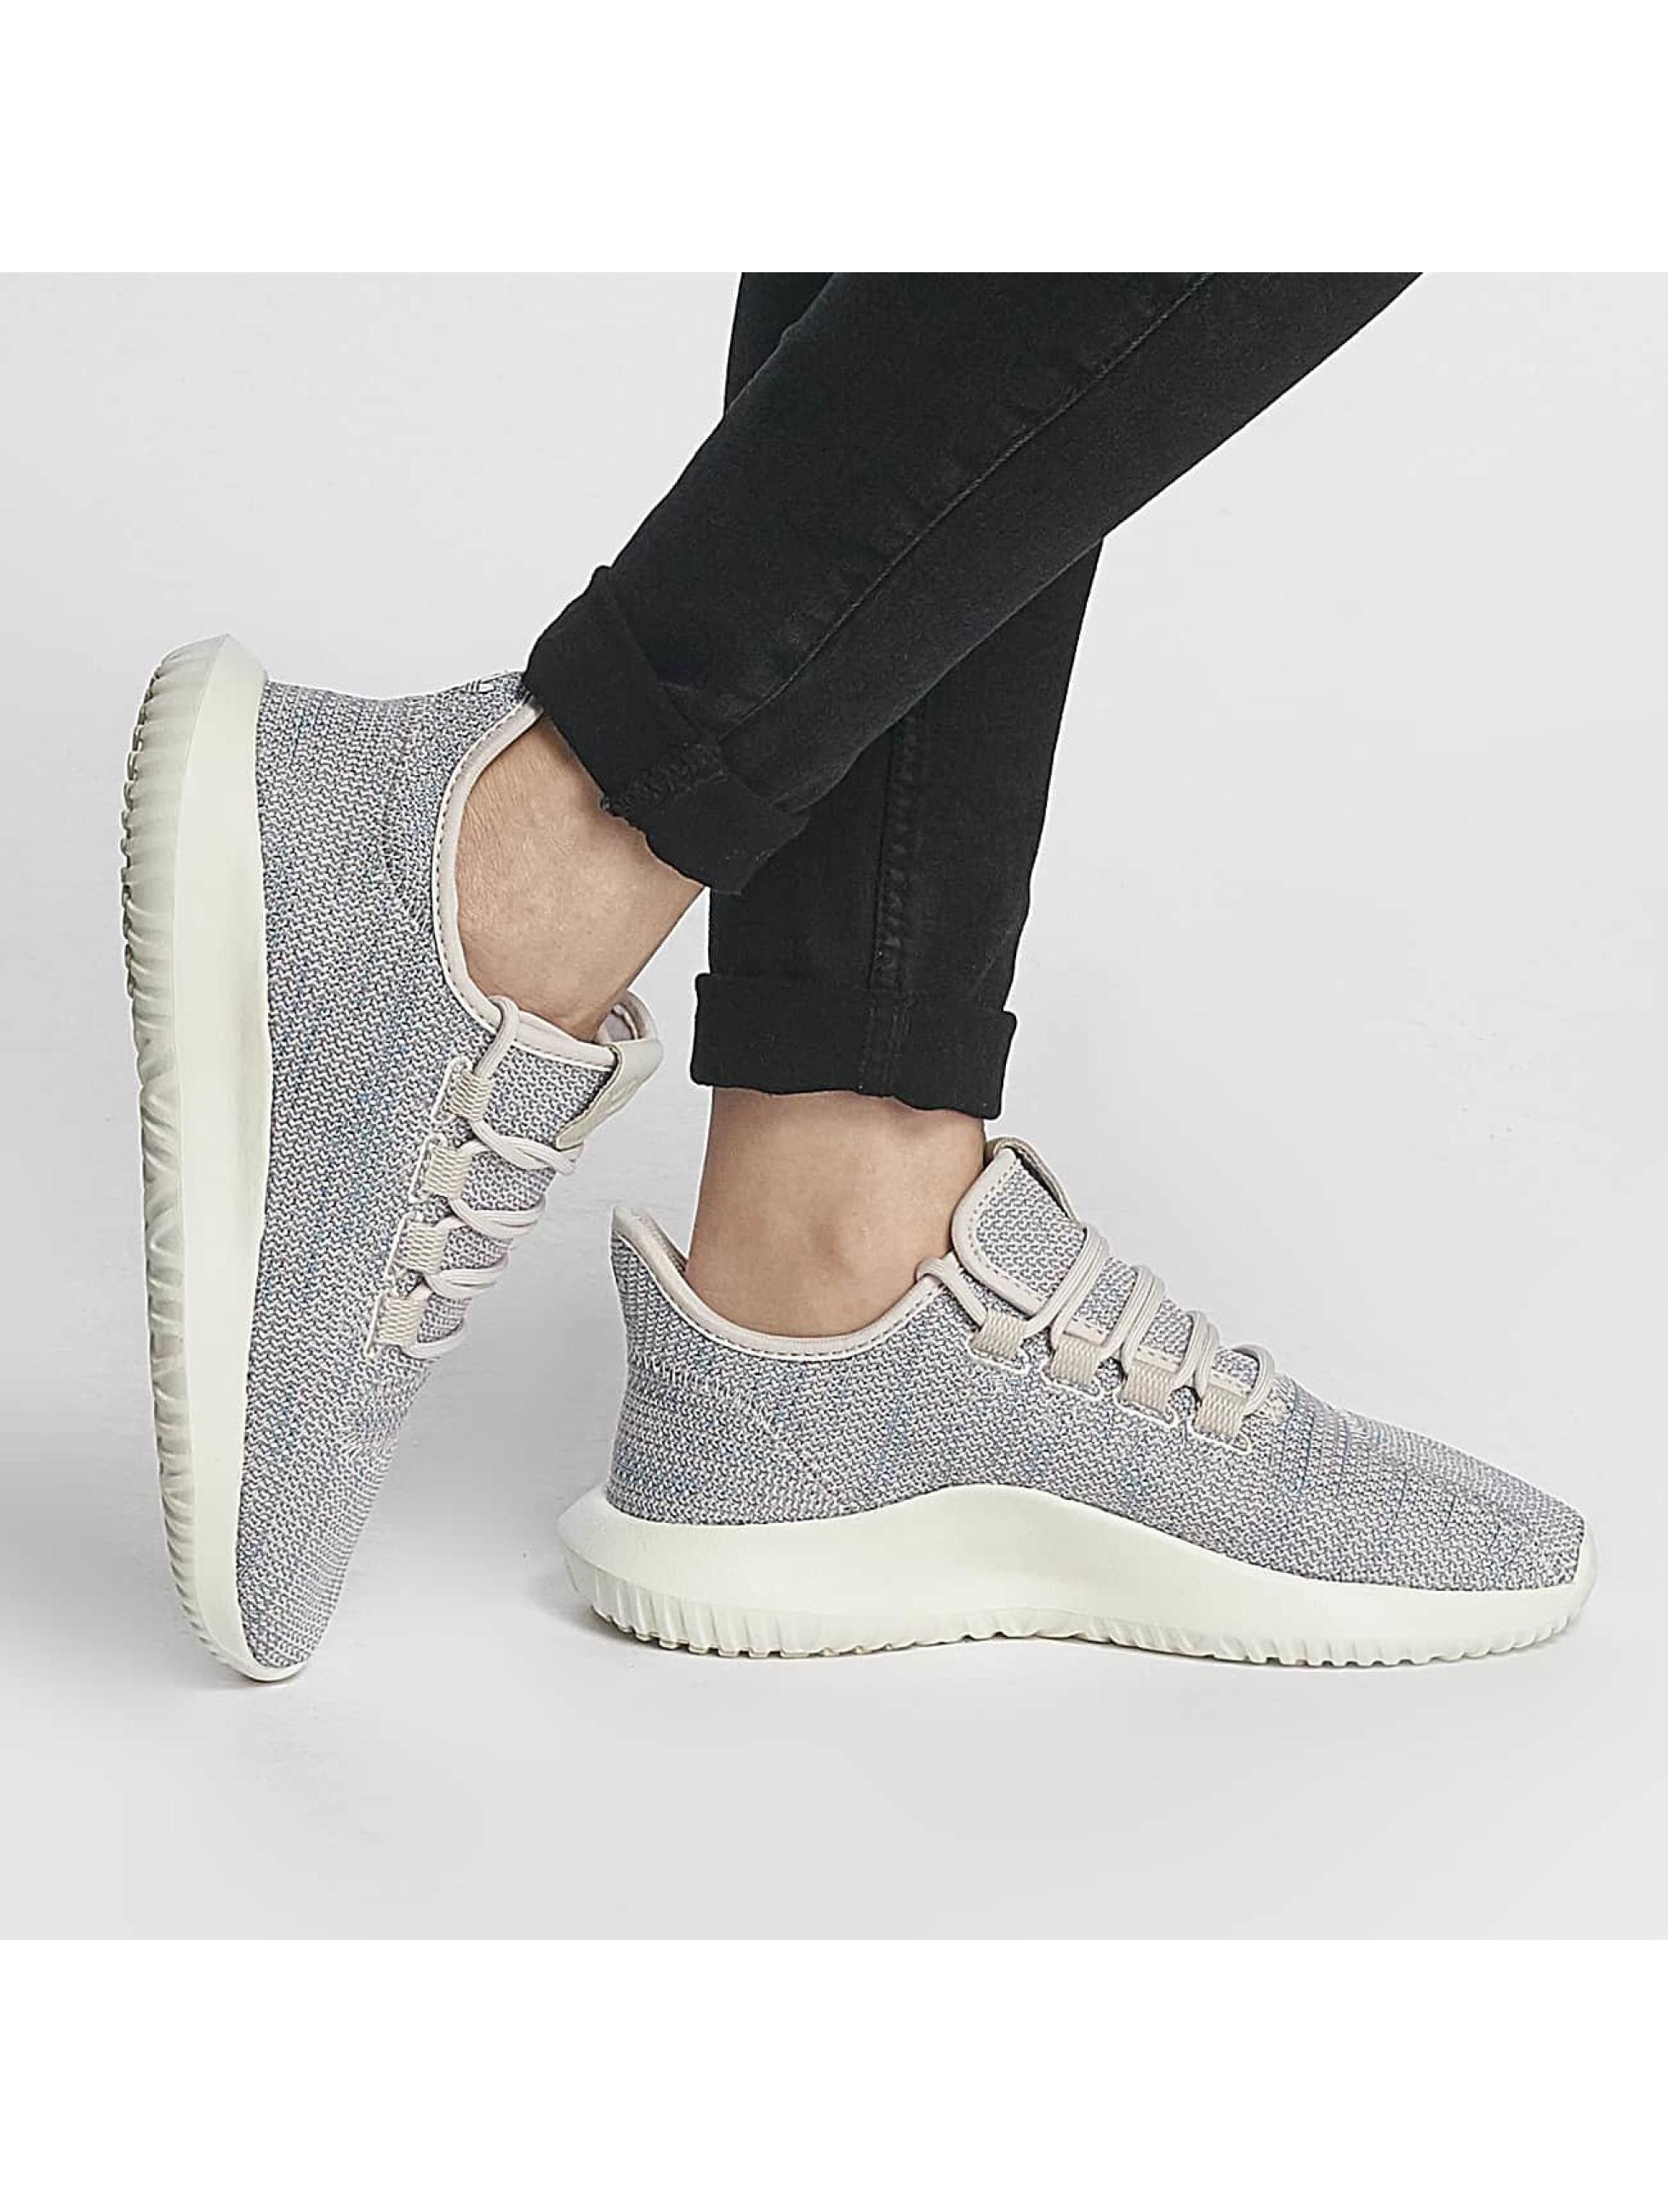 adidas damen sneaker tubular shadow ck in beige 437404. Black Bedroom Furniture Sets. Home Design Ideas